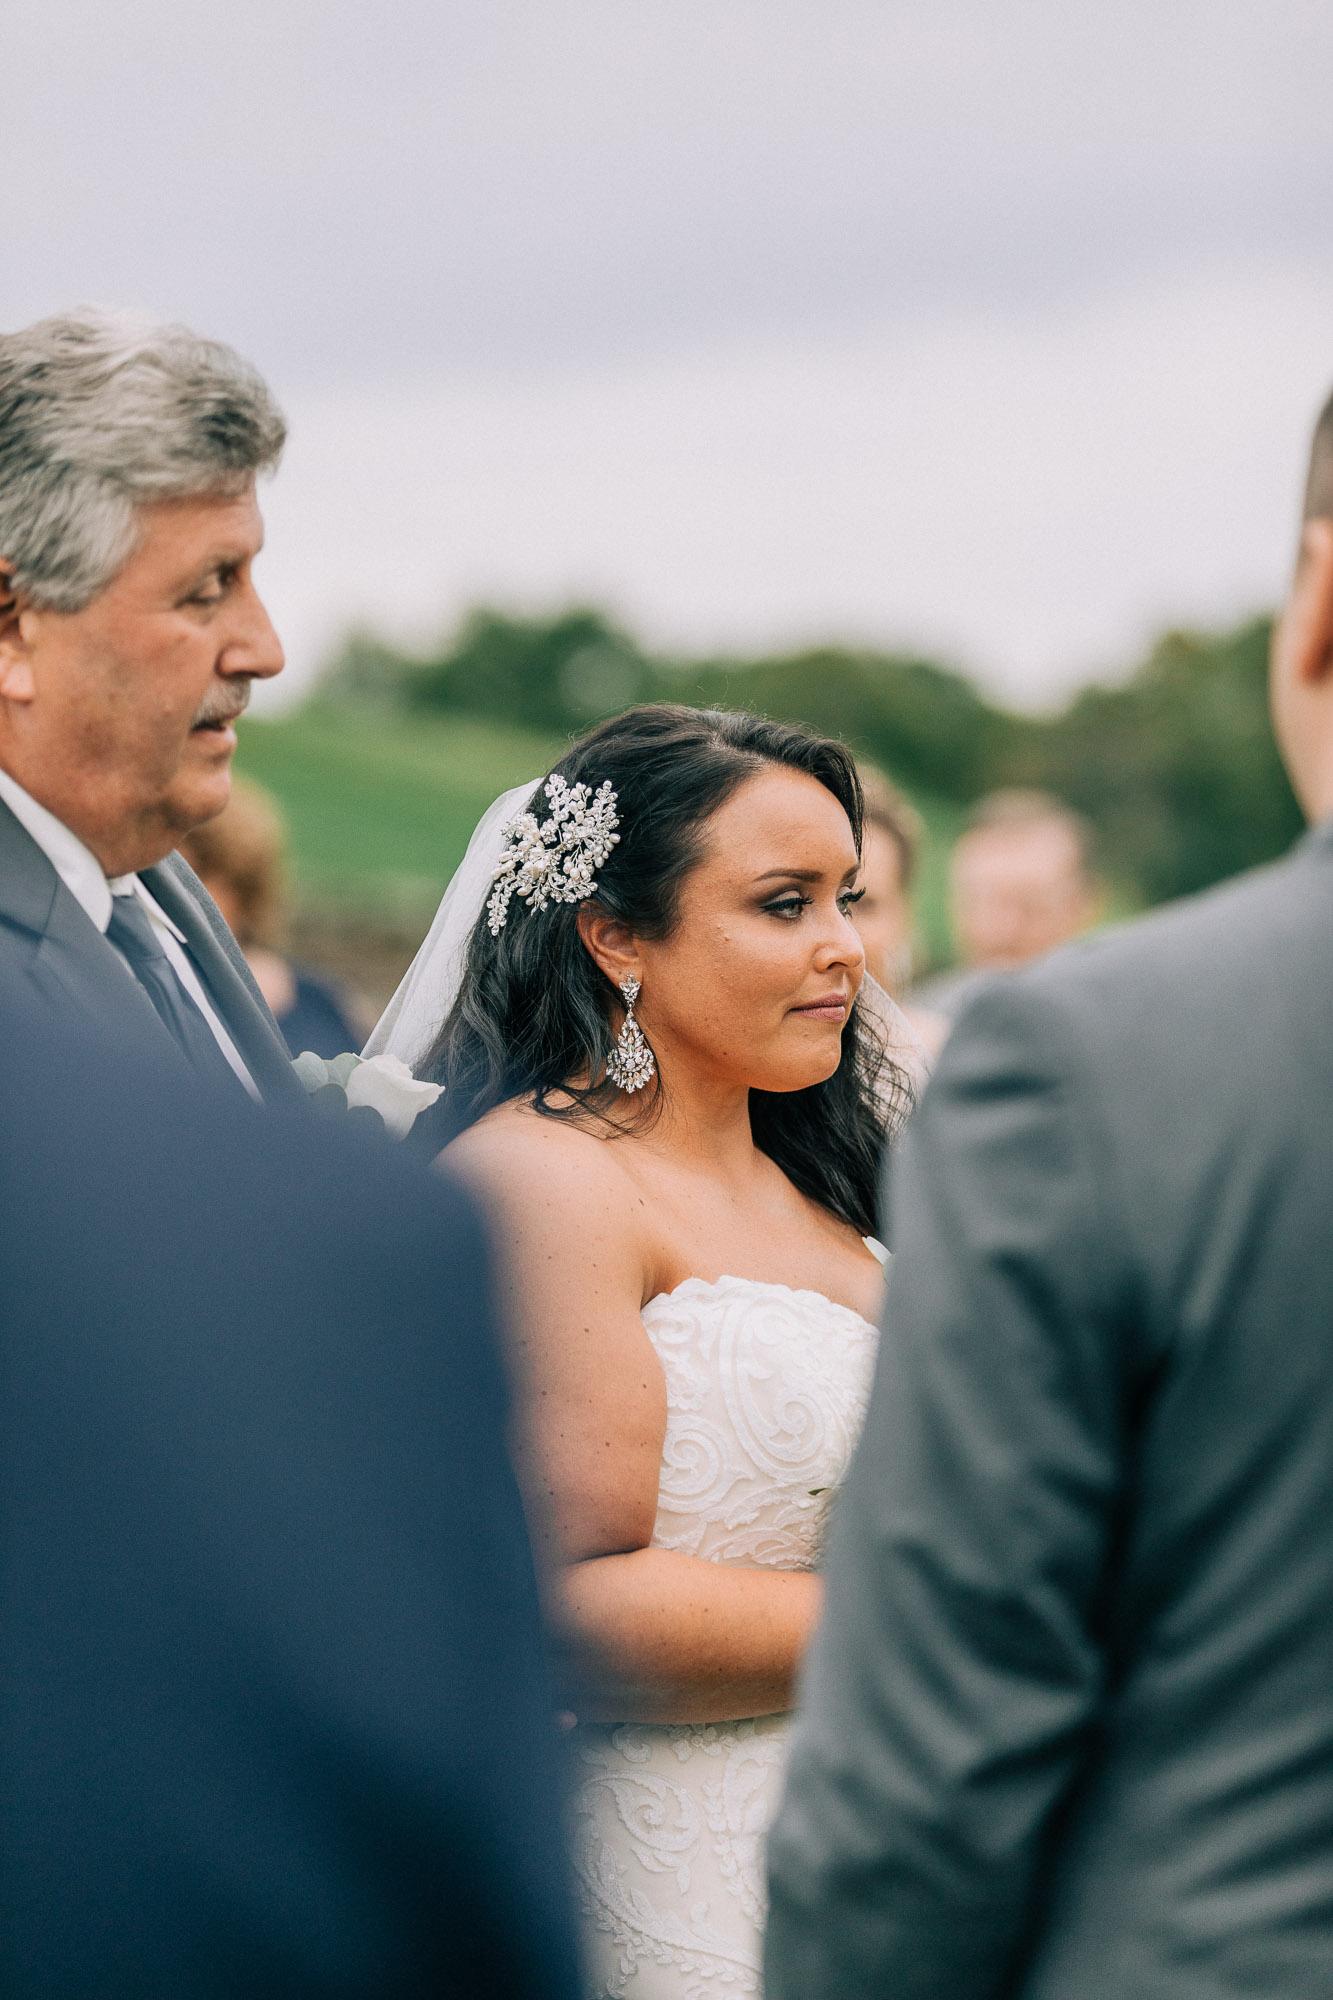 stonhedge-country-club-wedding-8226.jpg